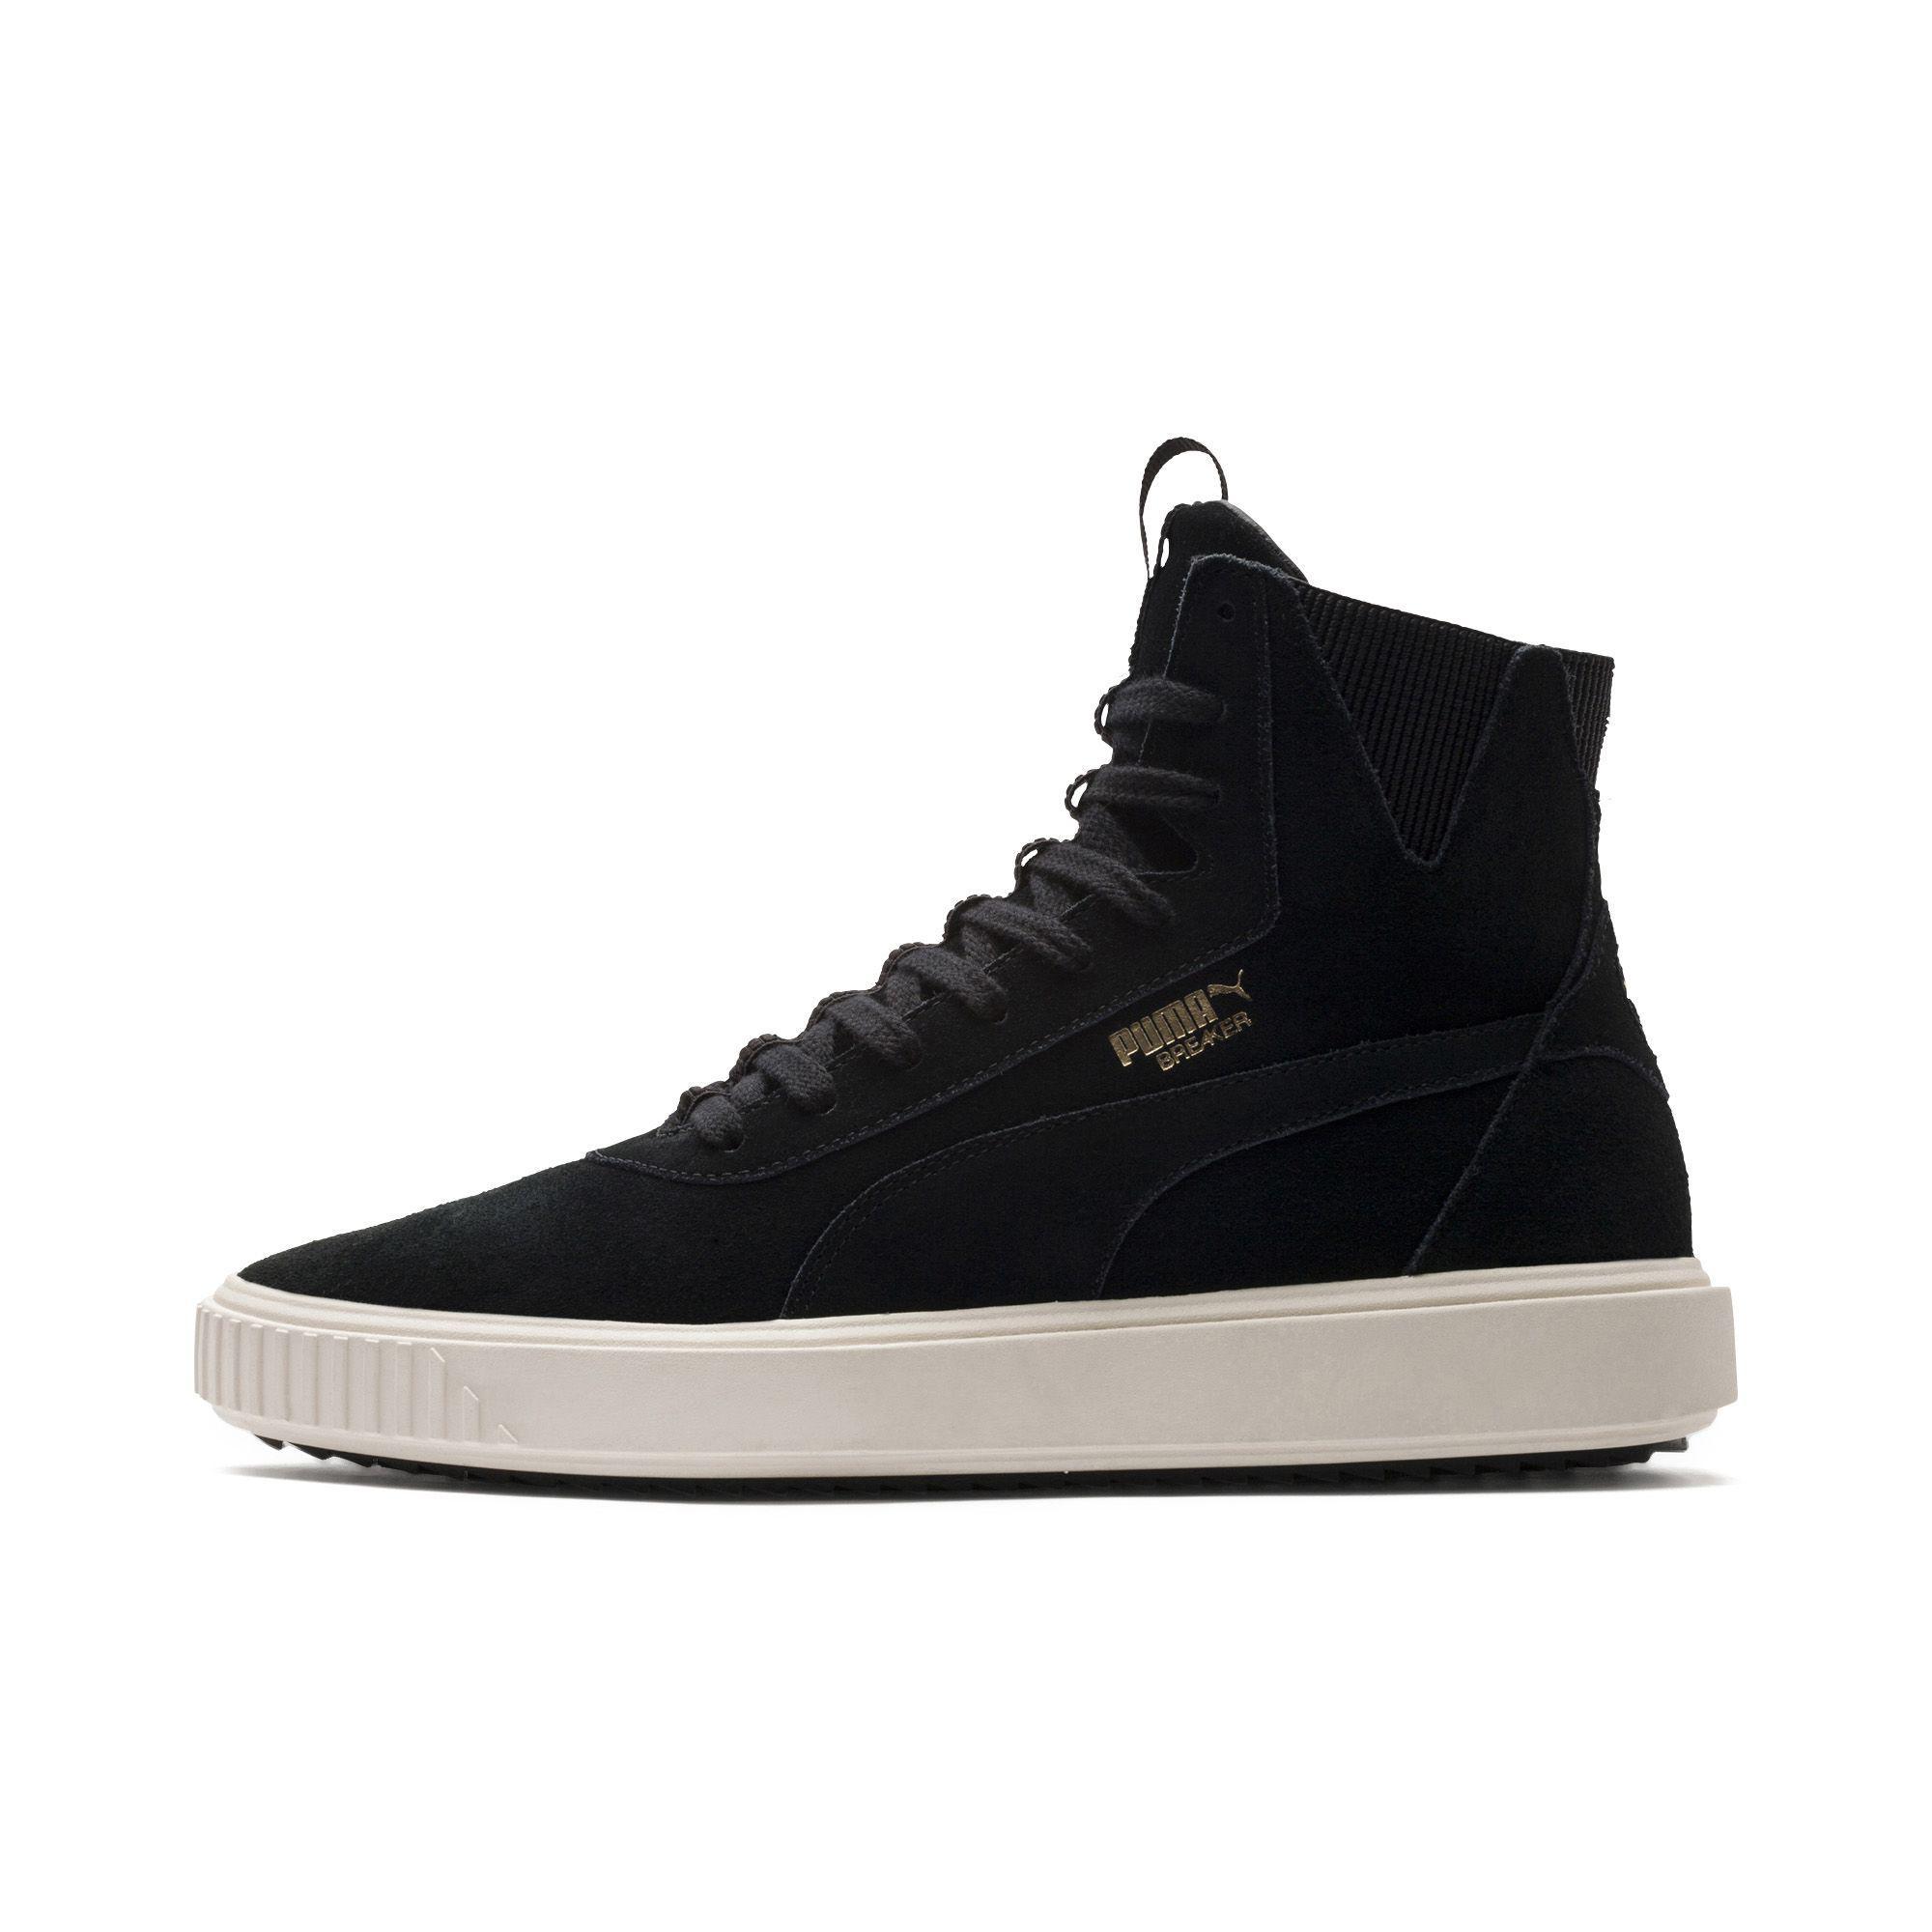 e4d88d846d3 Lyst - PUMA Breaker Hi Evolution Sneakers in Black for Men